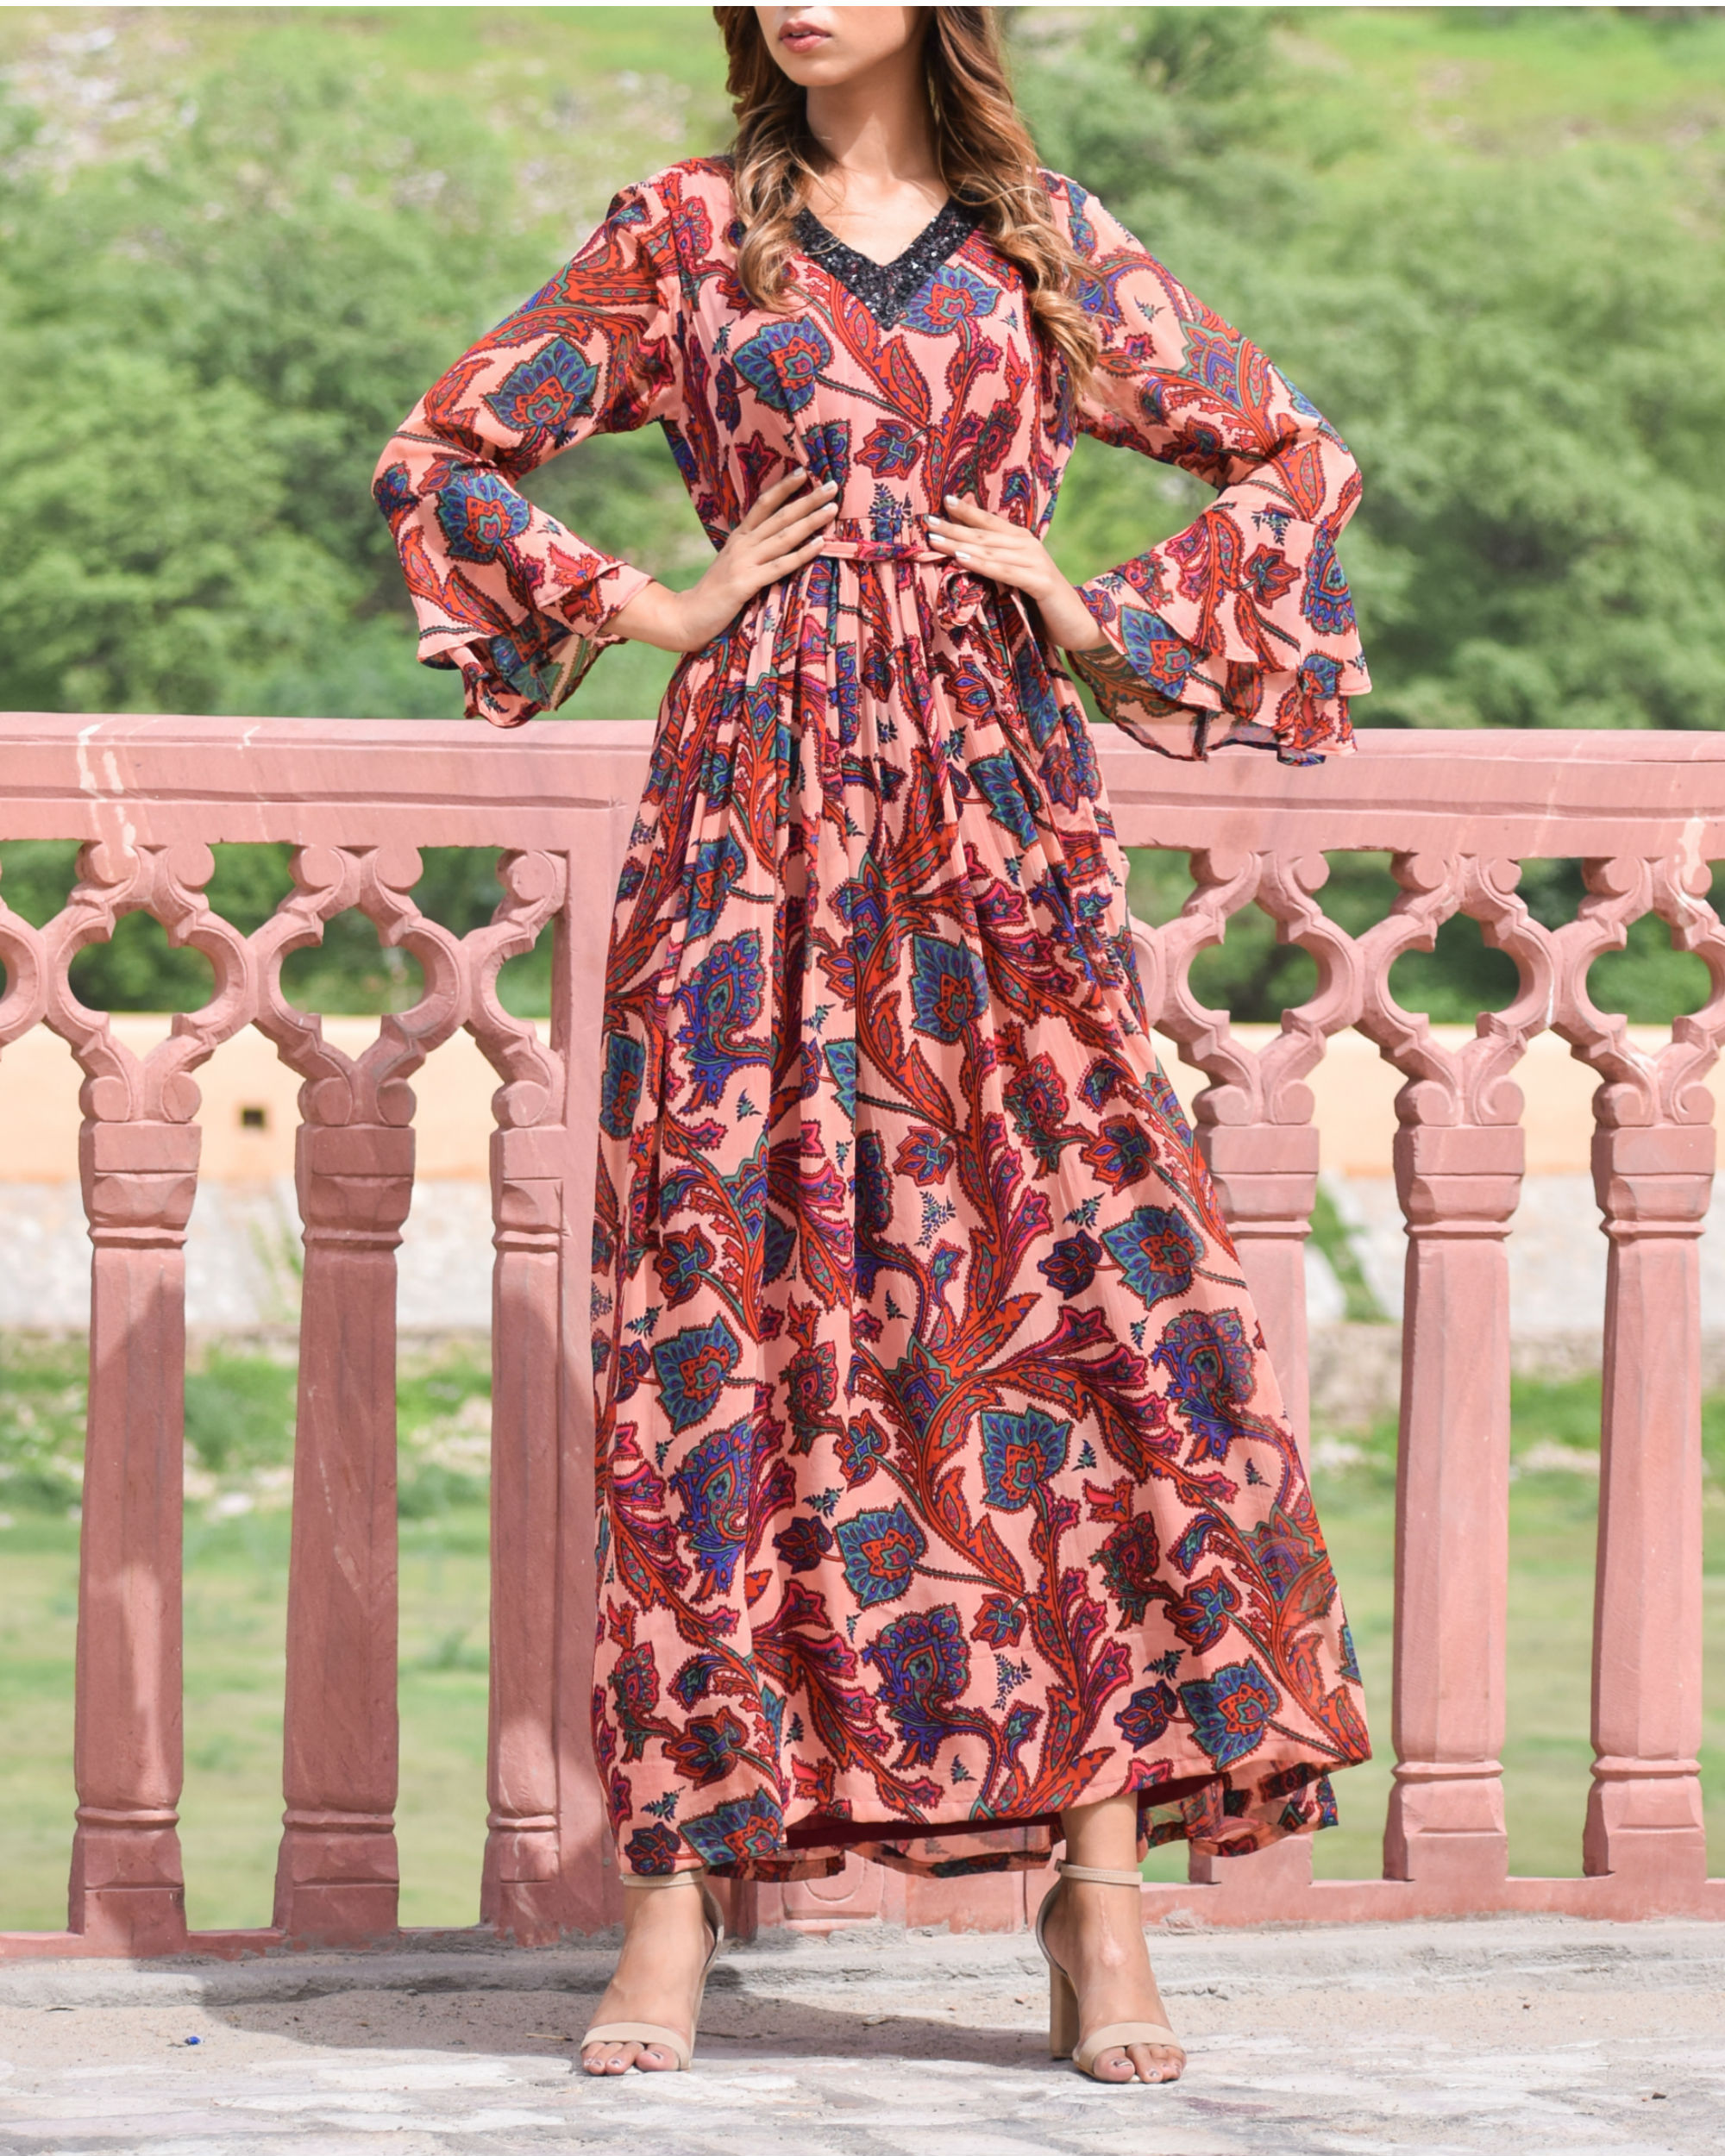 Red Georgette Dress